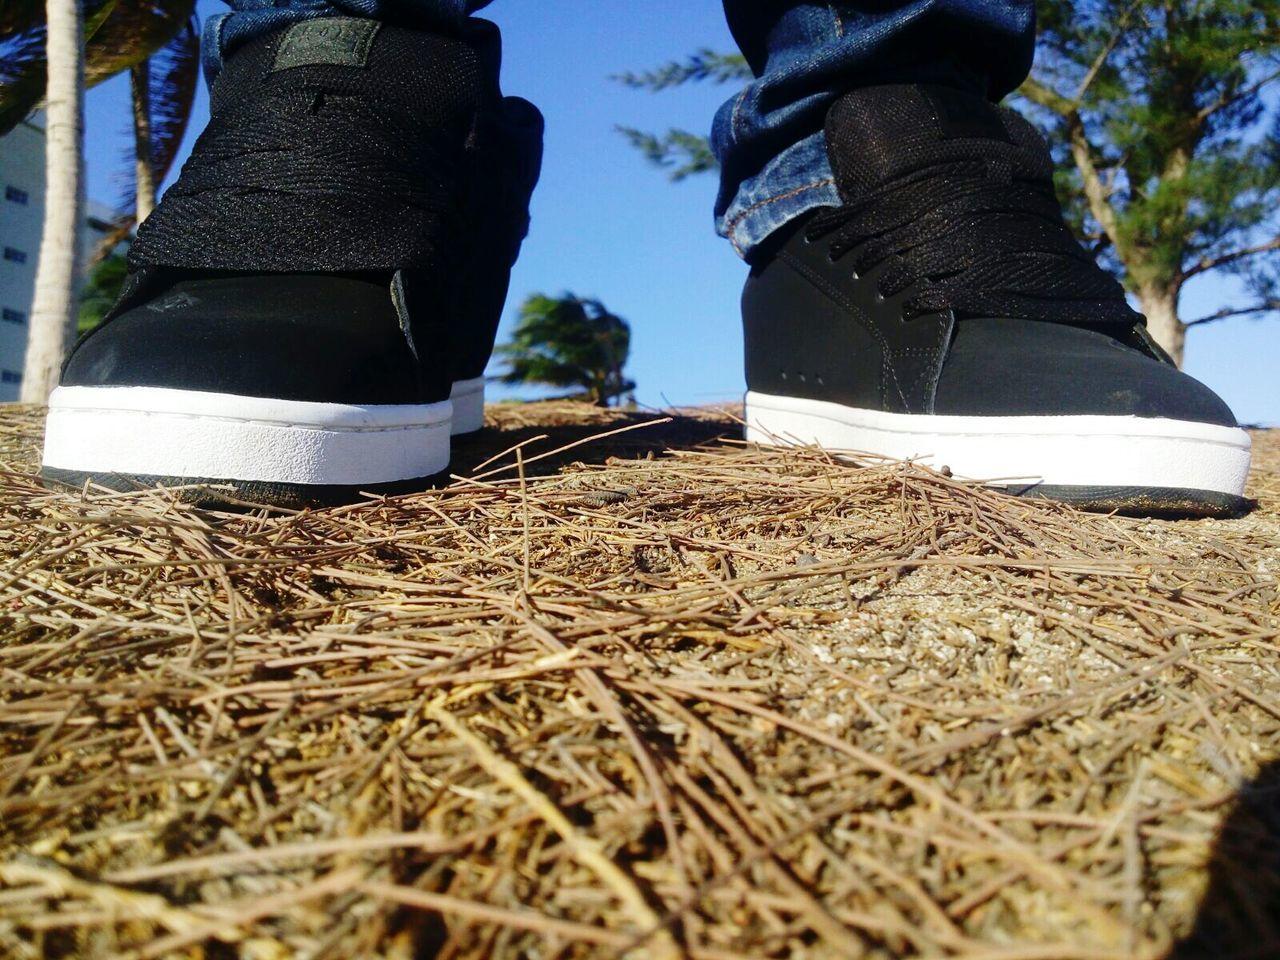 Close-Up Of Footwear